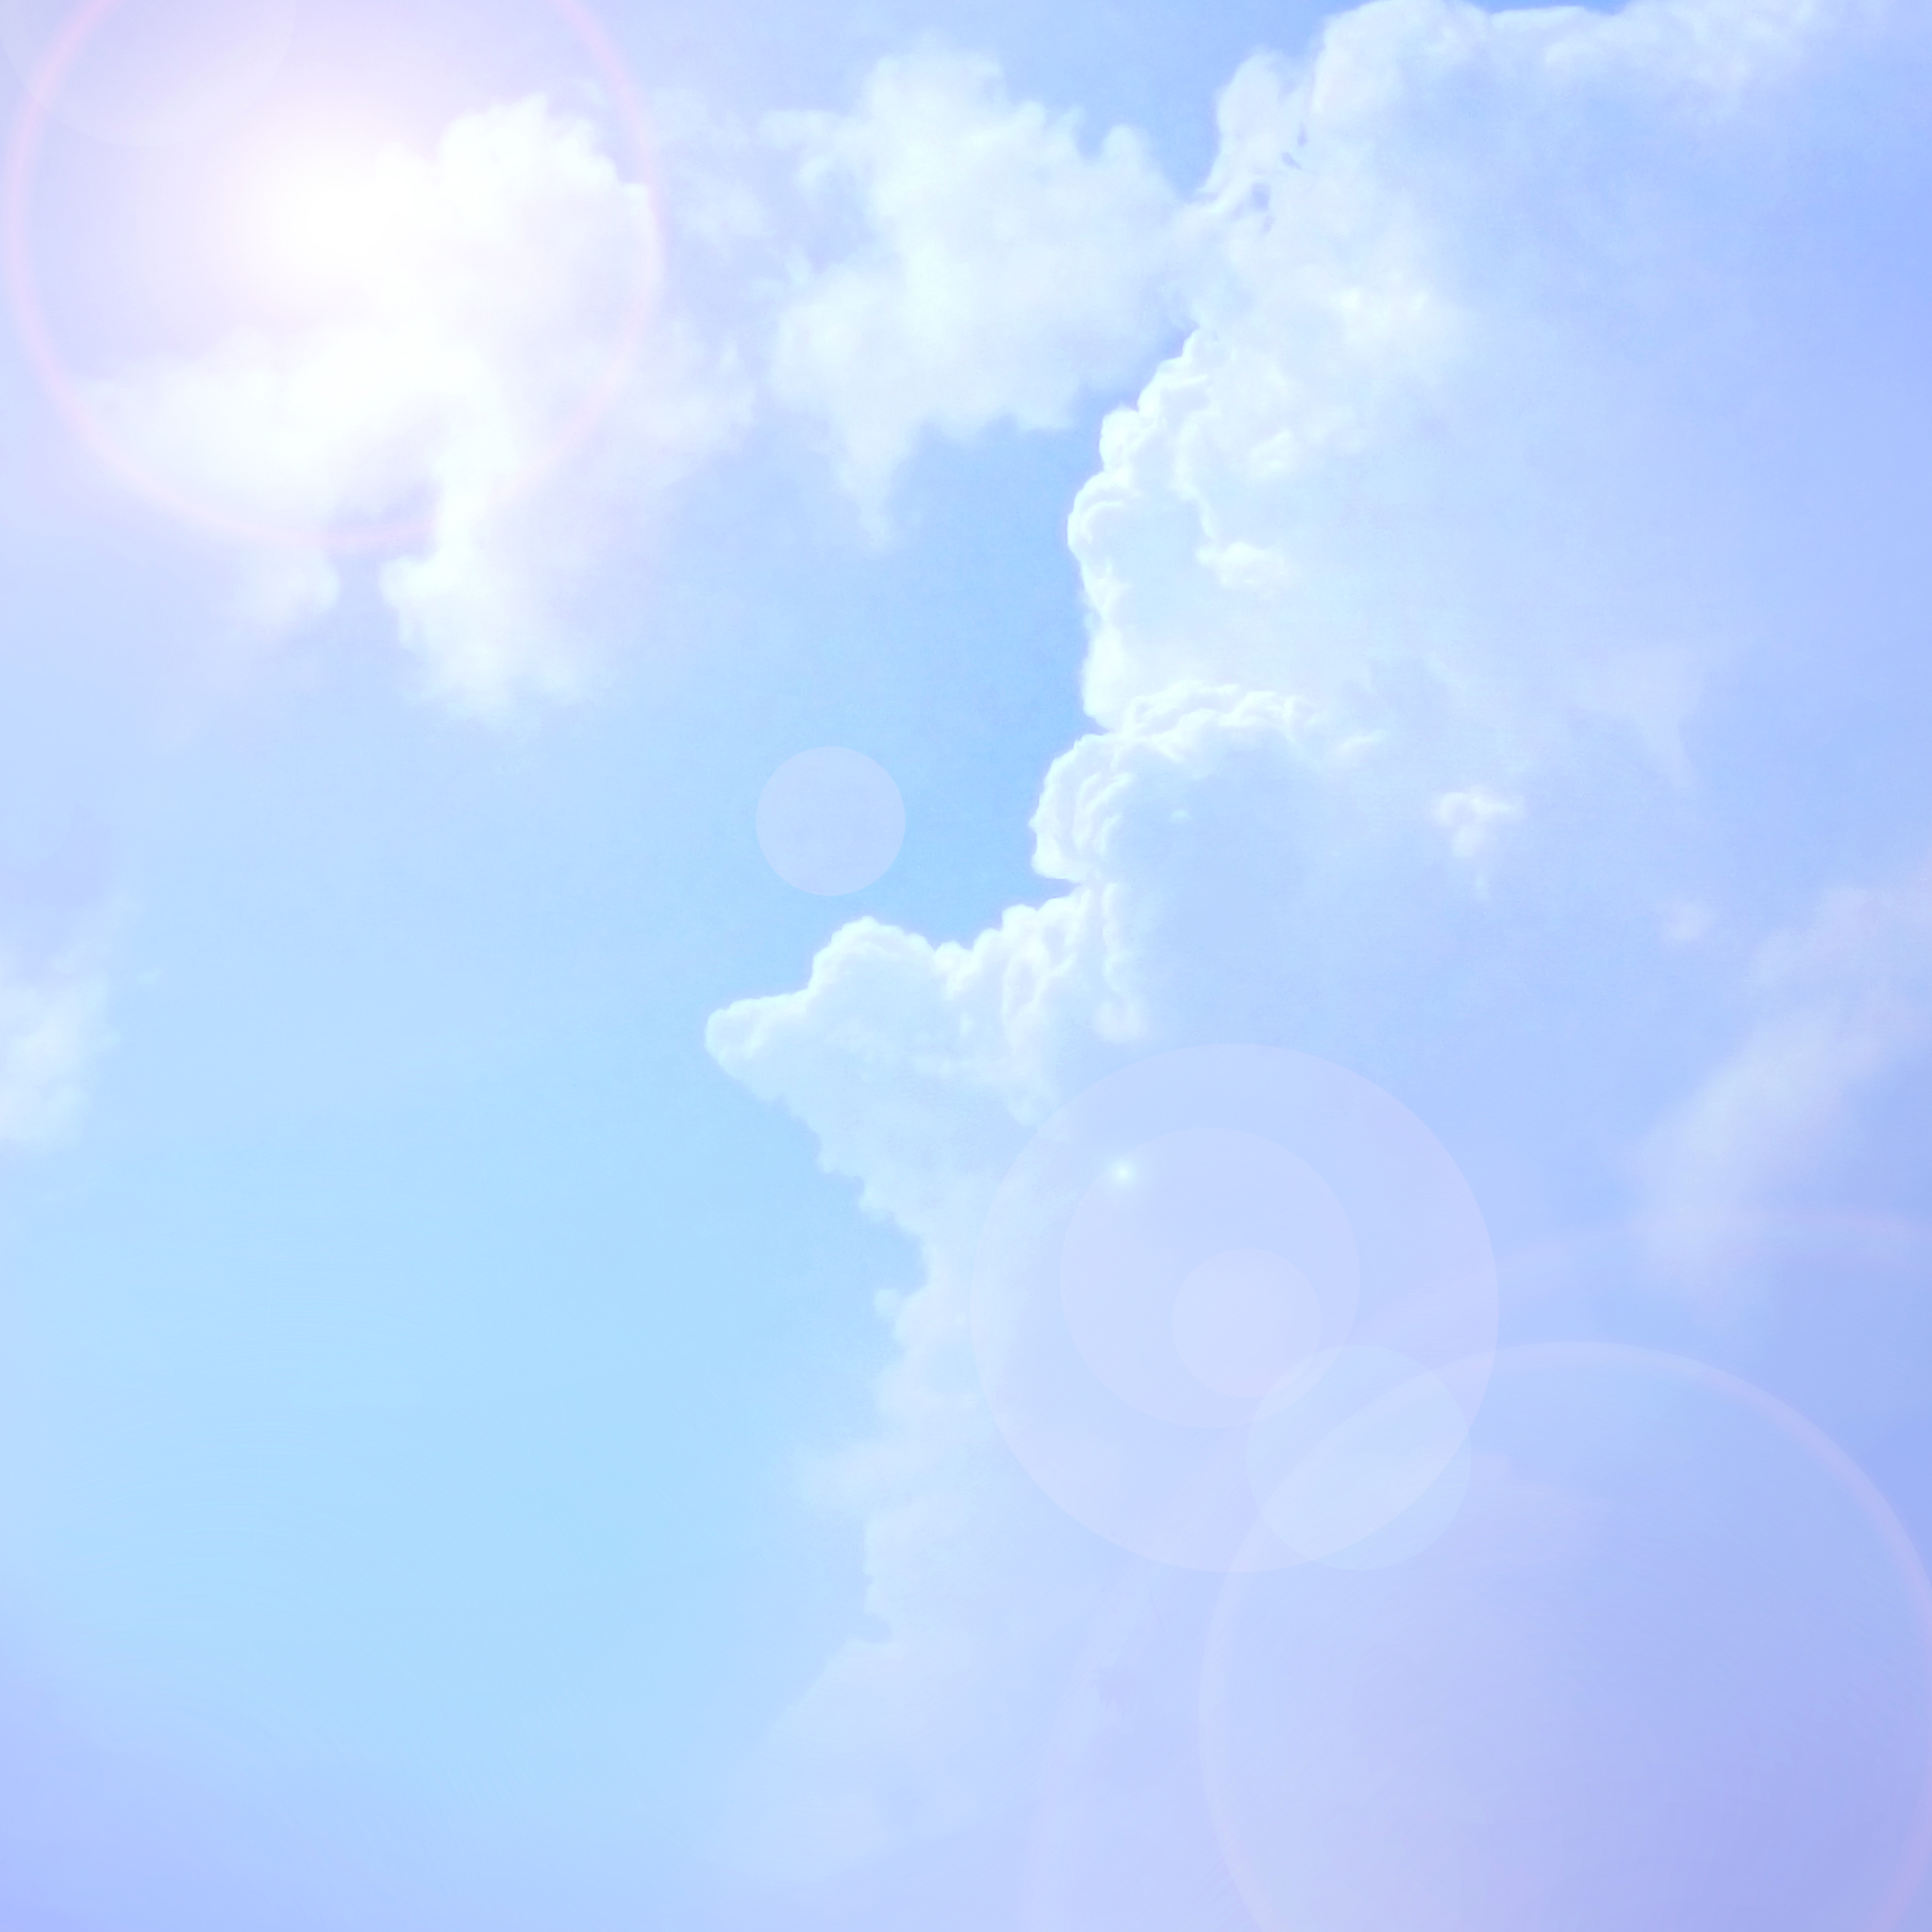 Sky-Scene-3Wallpapers-iPad-Retina